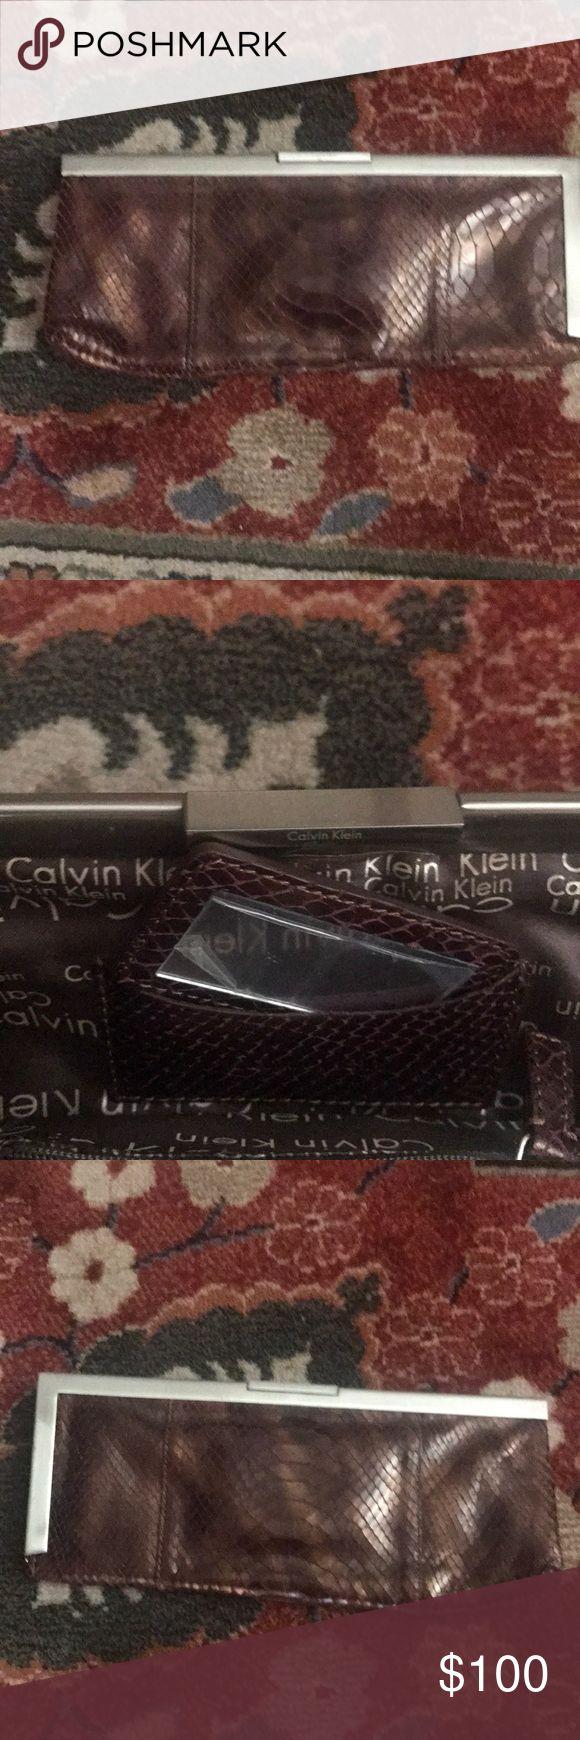 Calvin Klein Metallic Clutch Calvin Klein Metallic Clutch, excellent condition Calvin Klein Bags Clutches & Wristlets